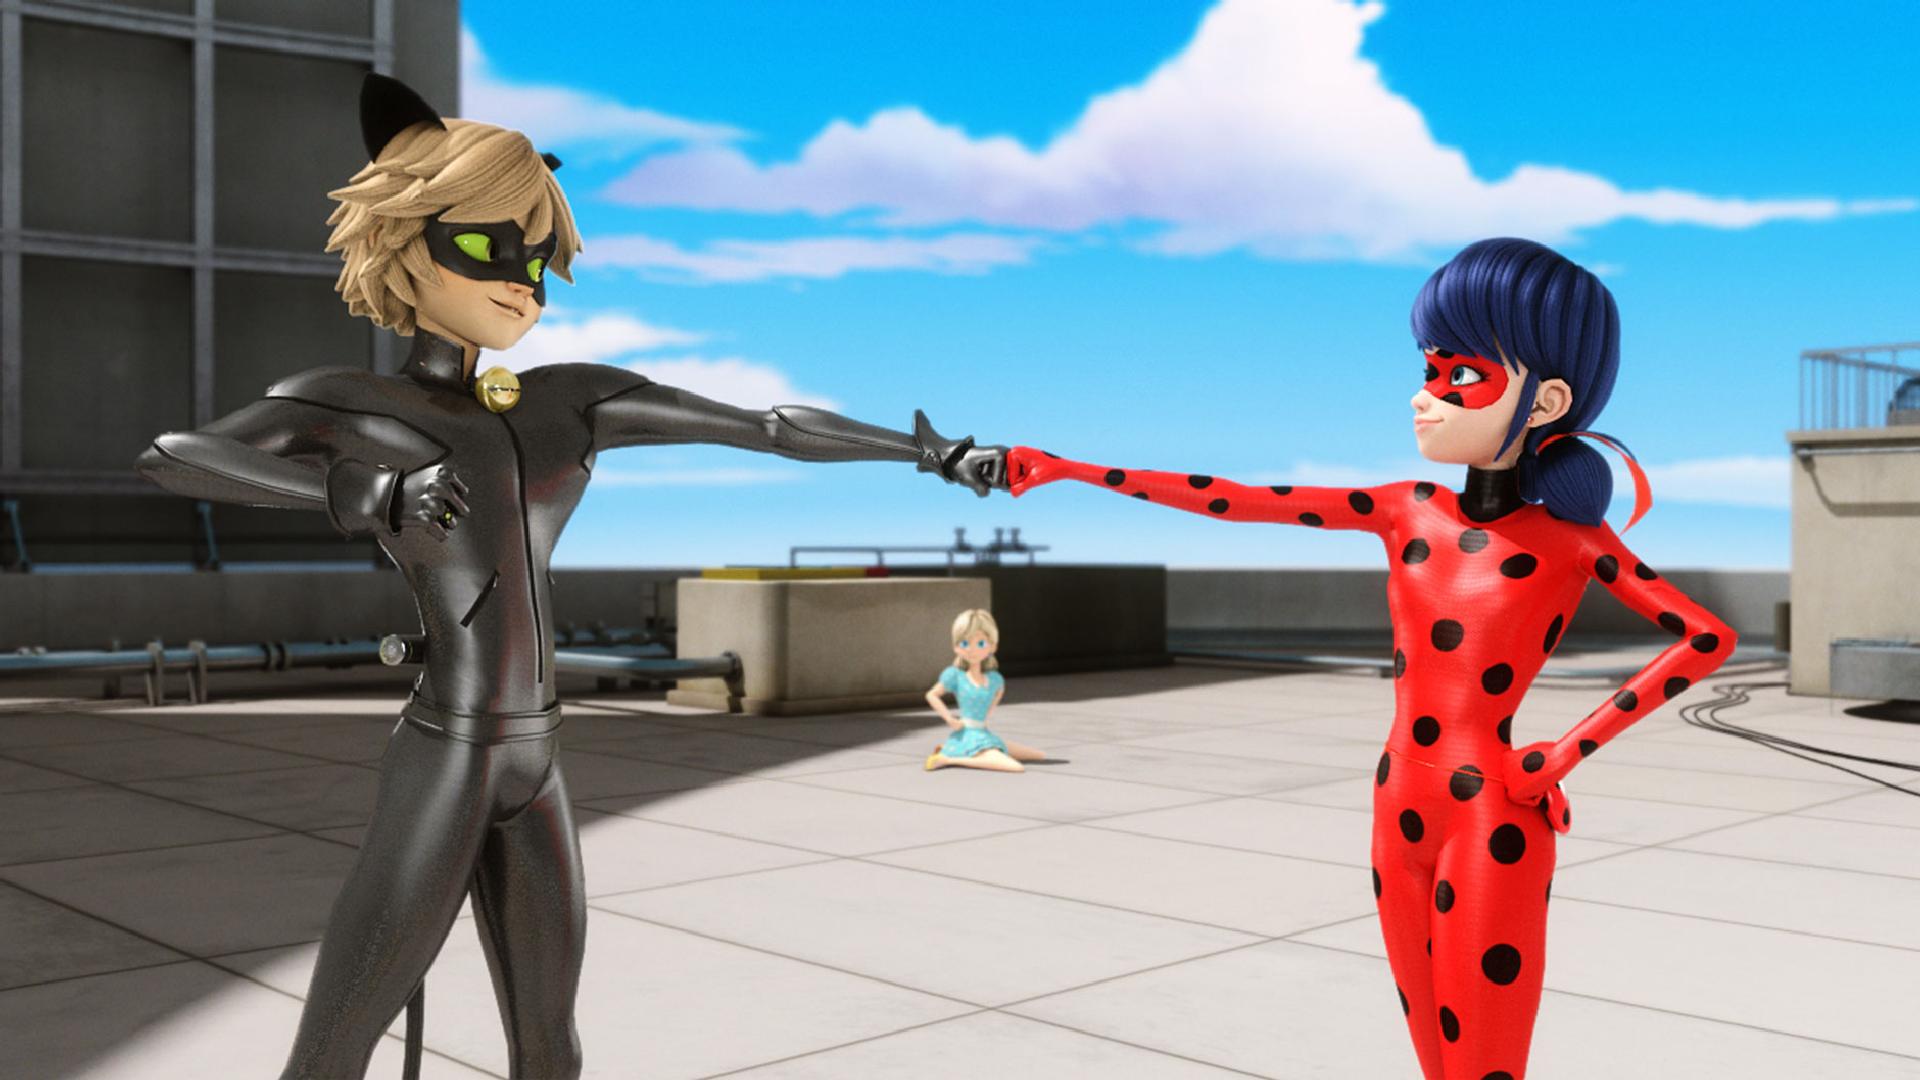 Miraculous Ladybug 壁紙